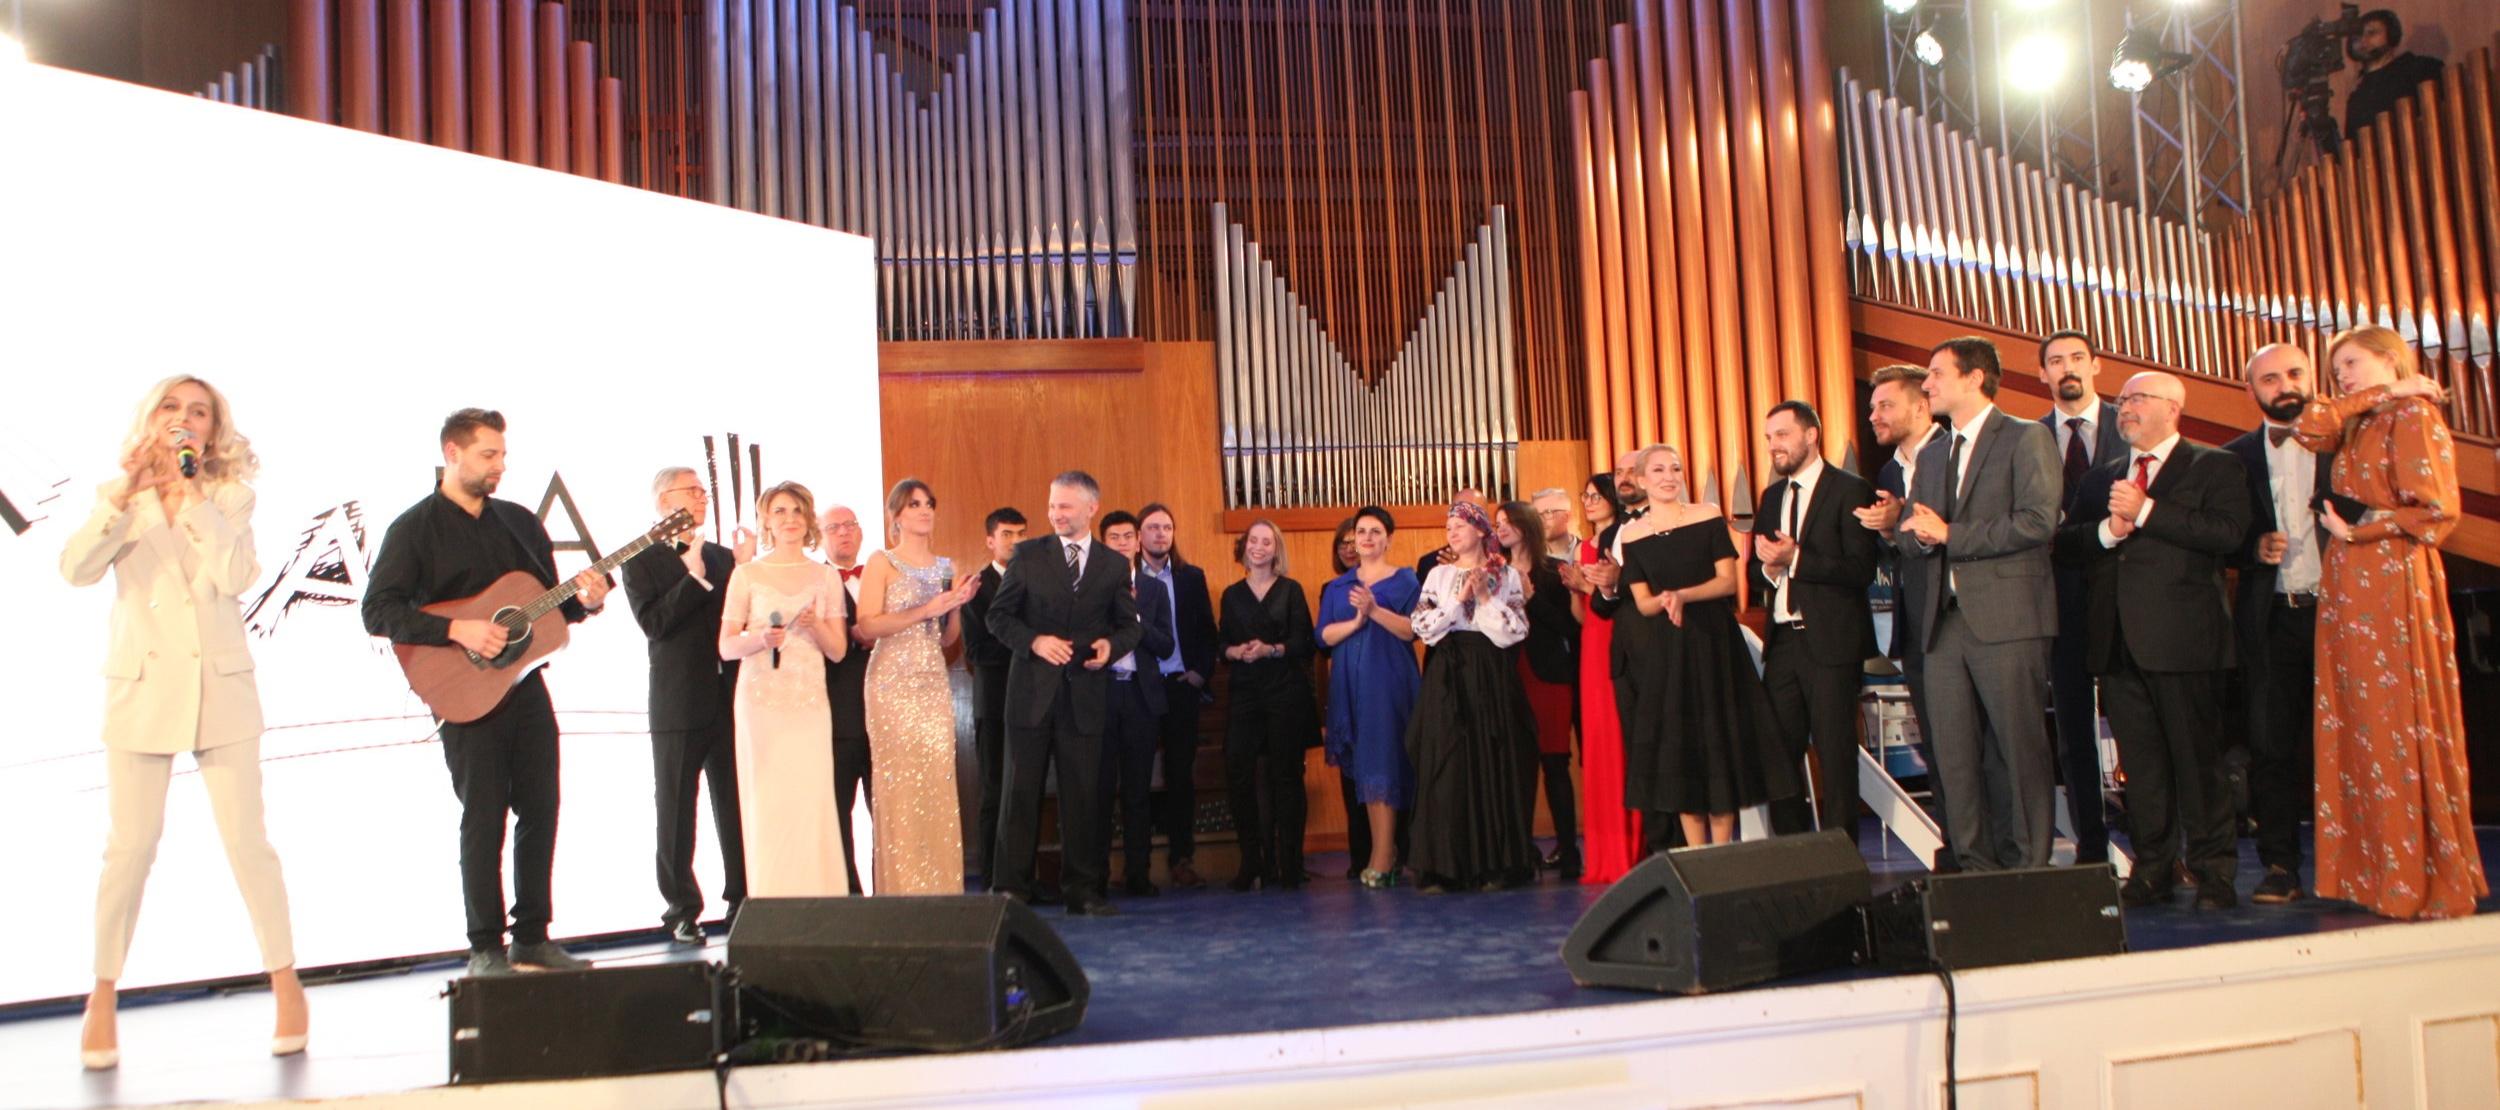 ADAMI GALA 2018 - Chisinau, Moldova